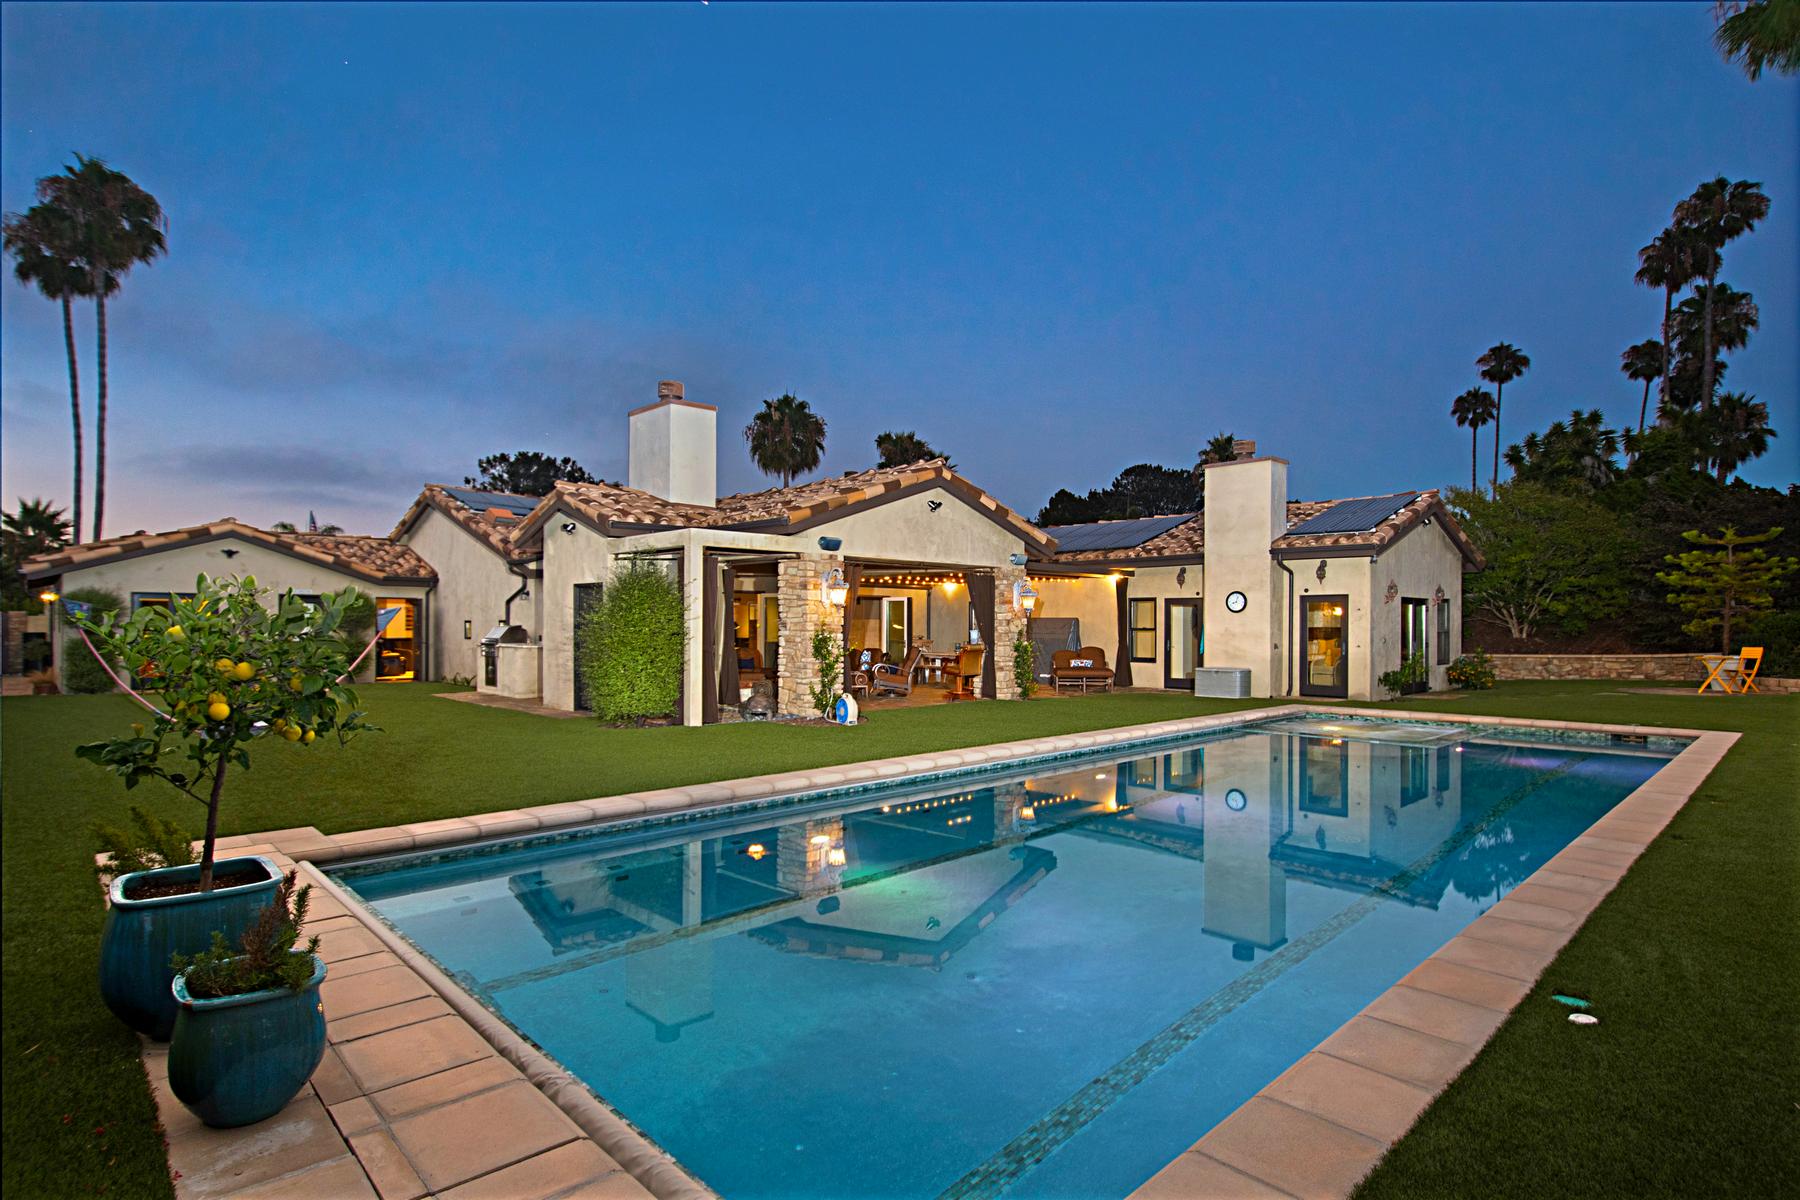 Single Family Home for Sale at 313 -315 San Lucas Drive 313 -315 San Lucas Drive Solana Beach, California 92075 United States